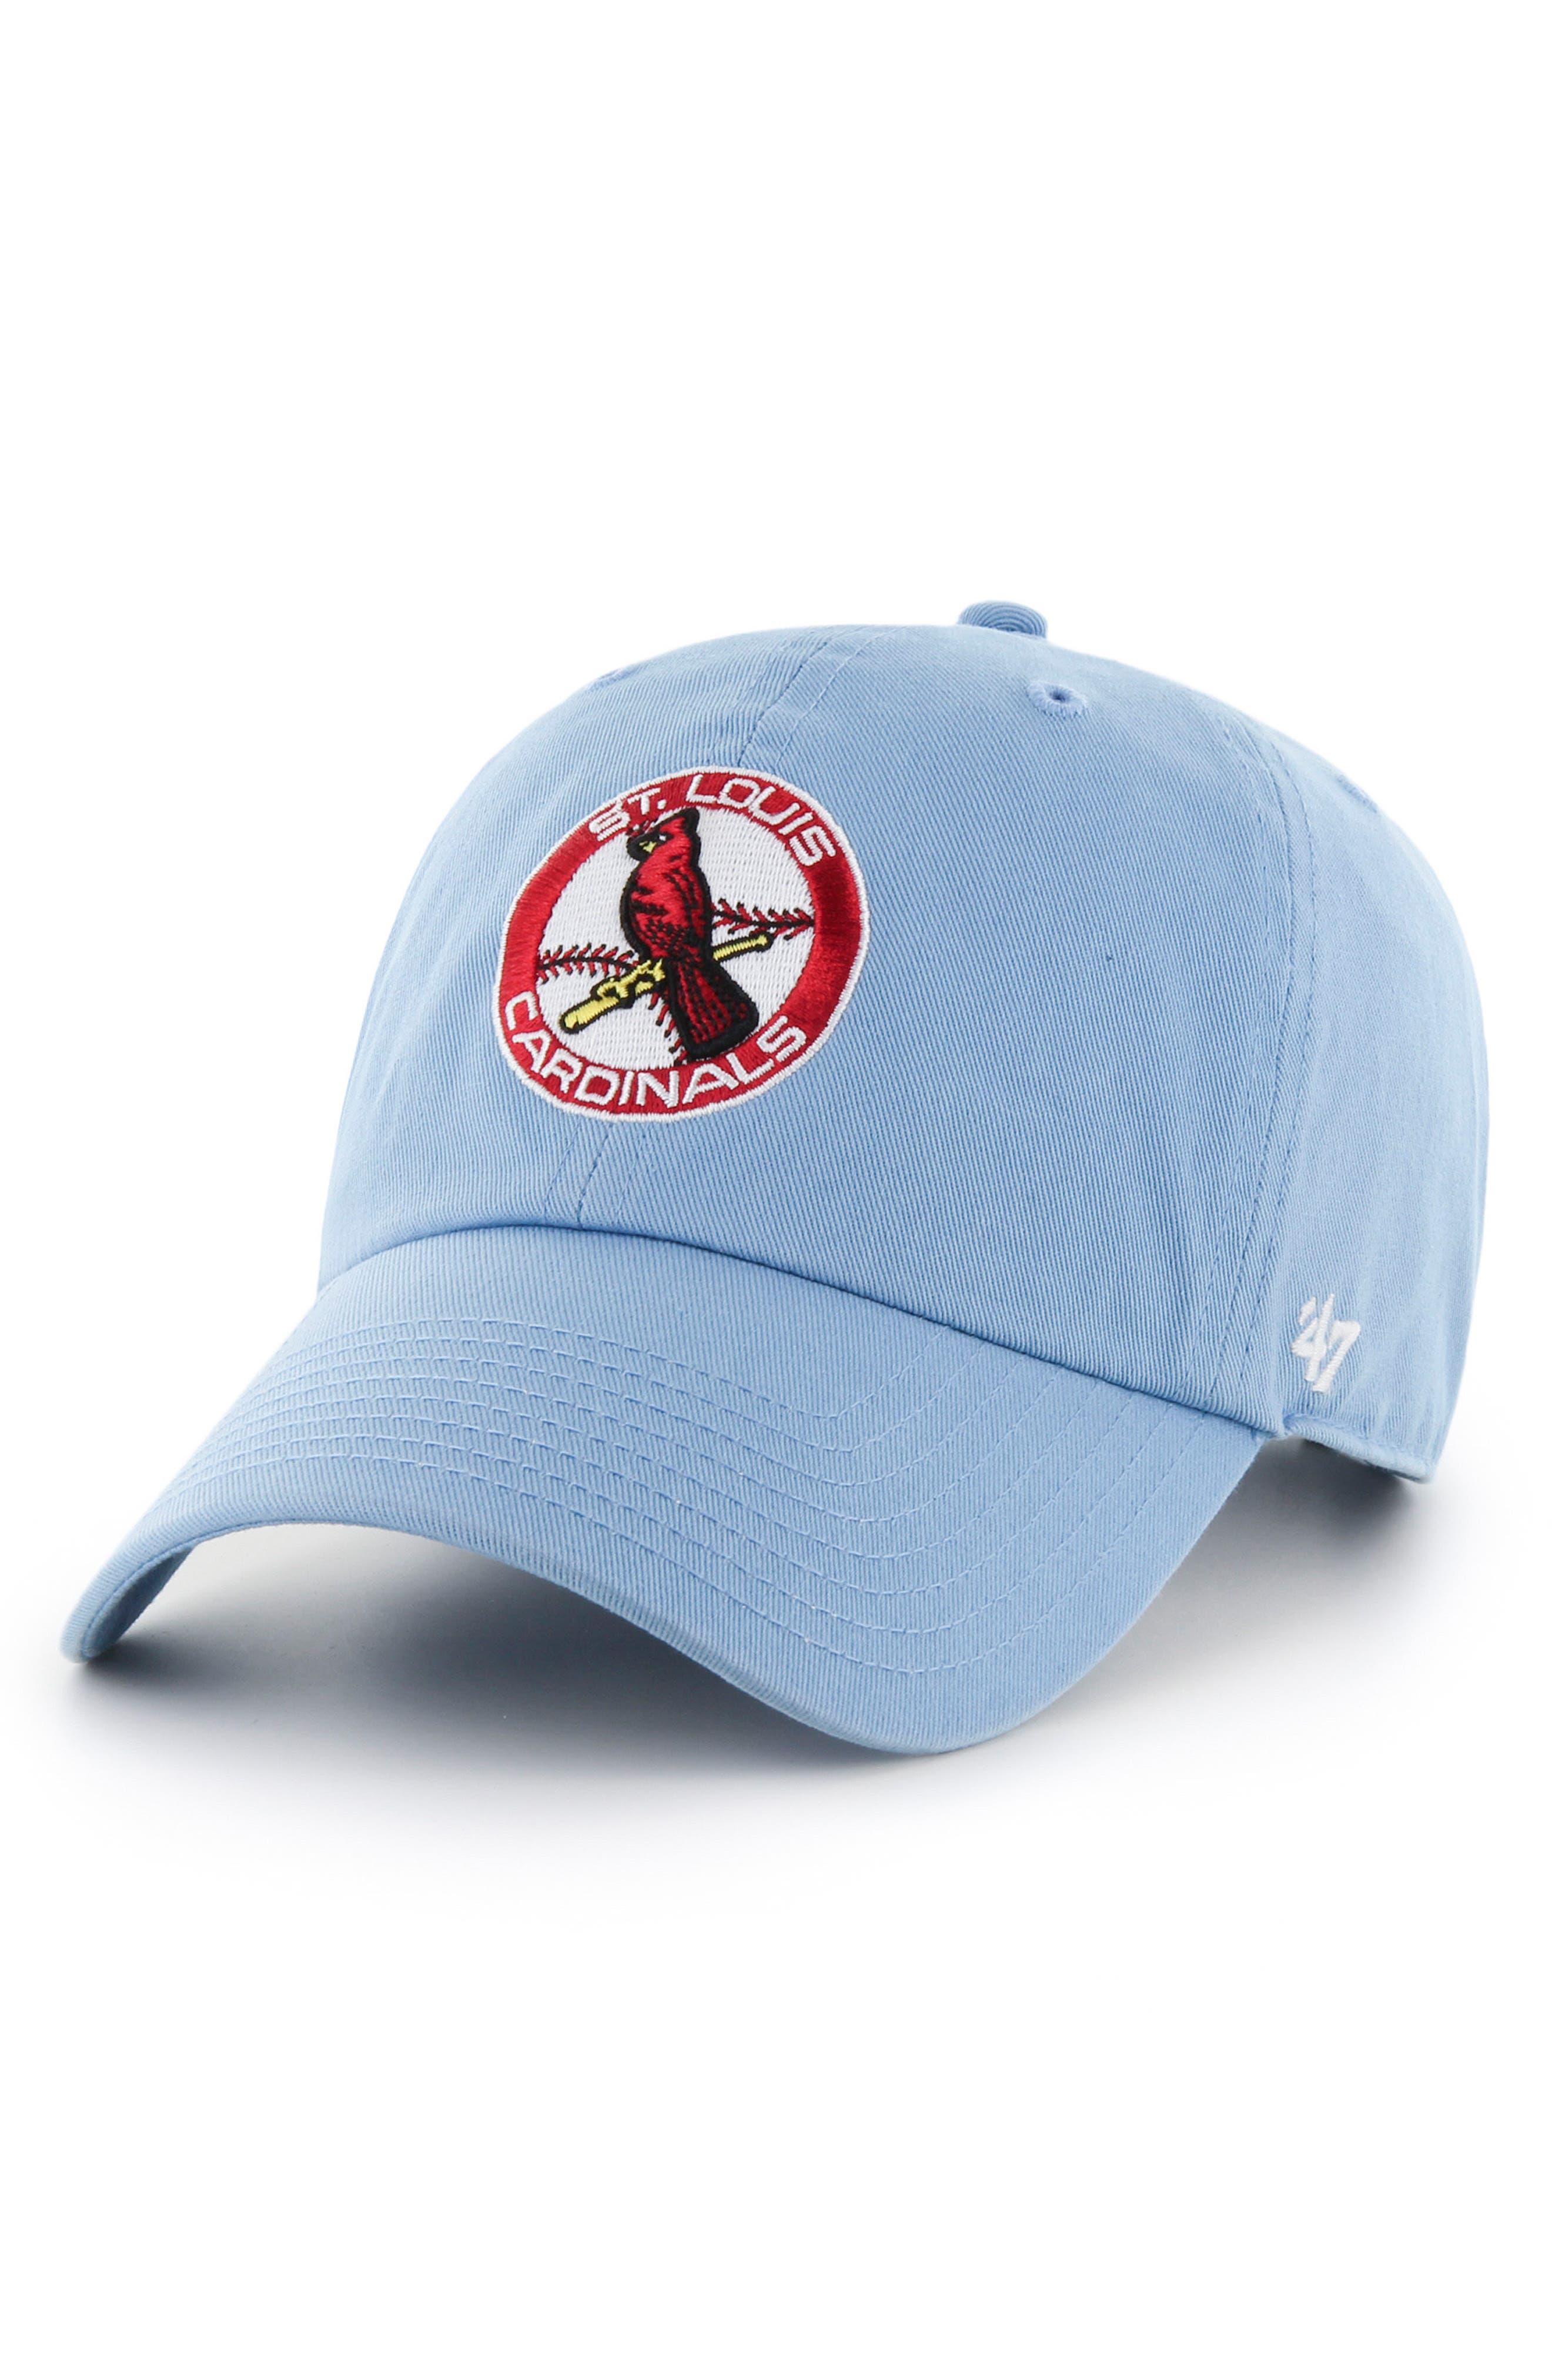 MLB Cooperstown Logo Ball Cap,                             Main thumbnail 13, color,